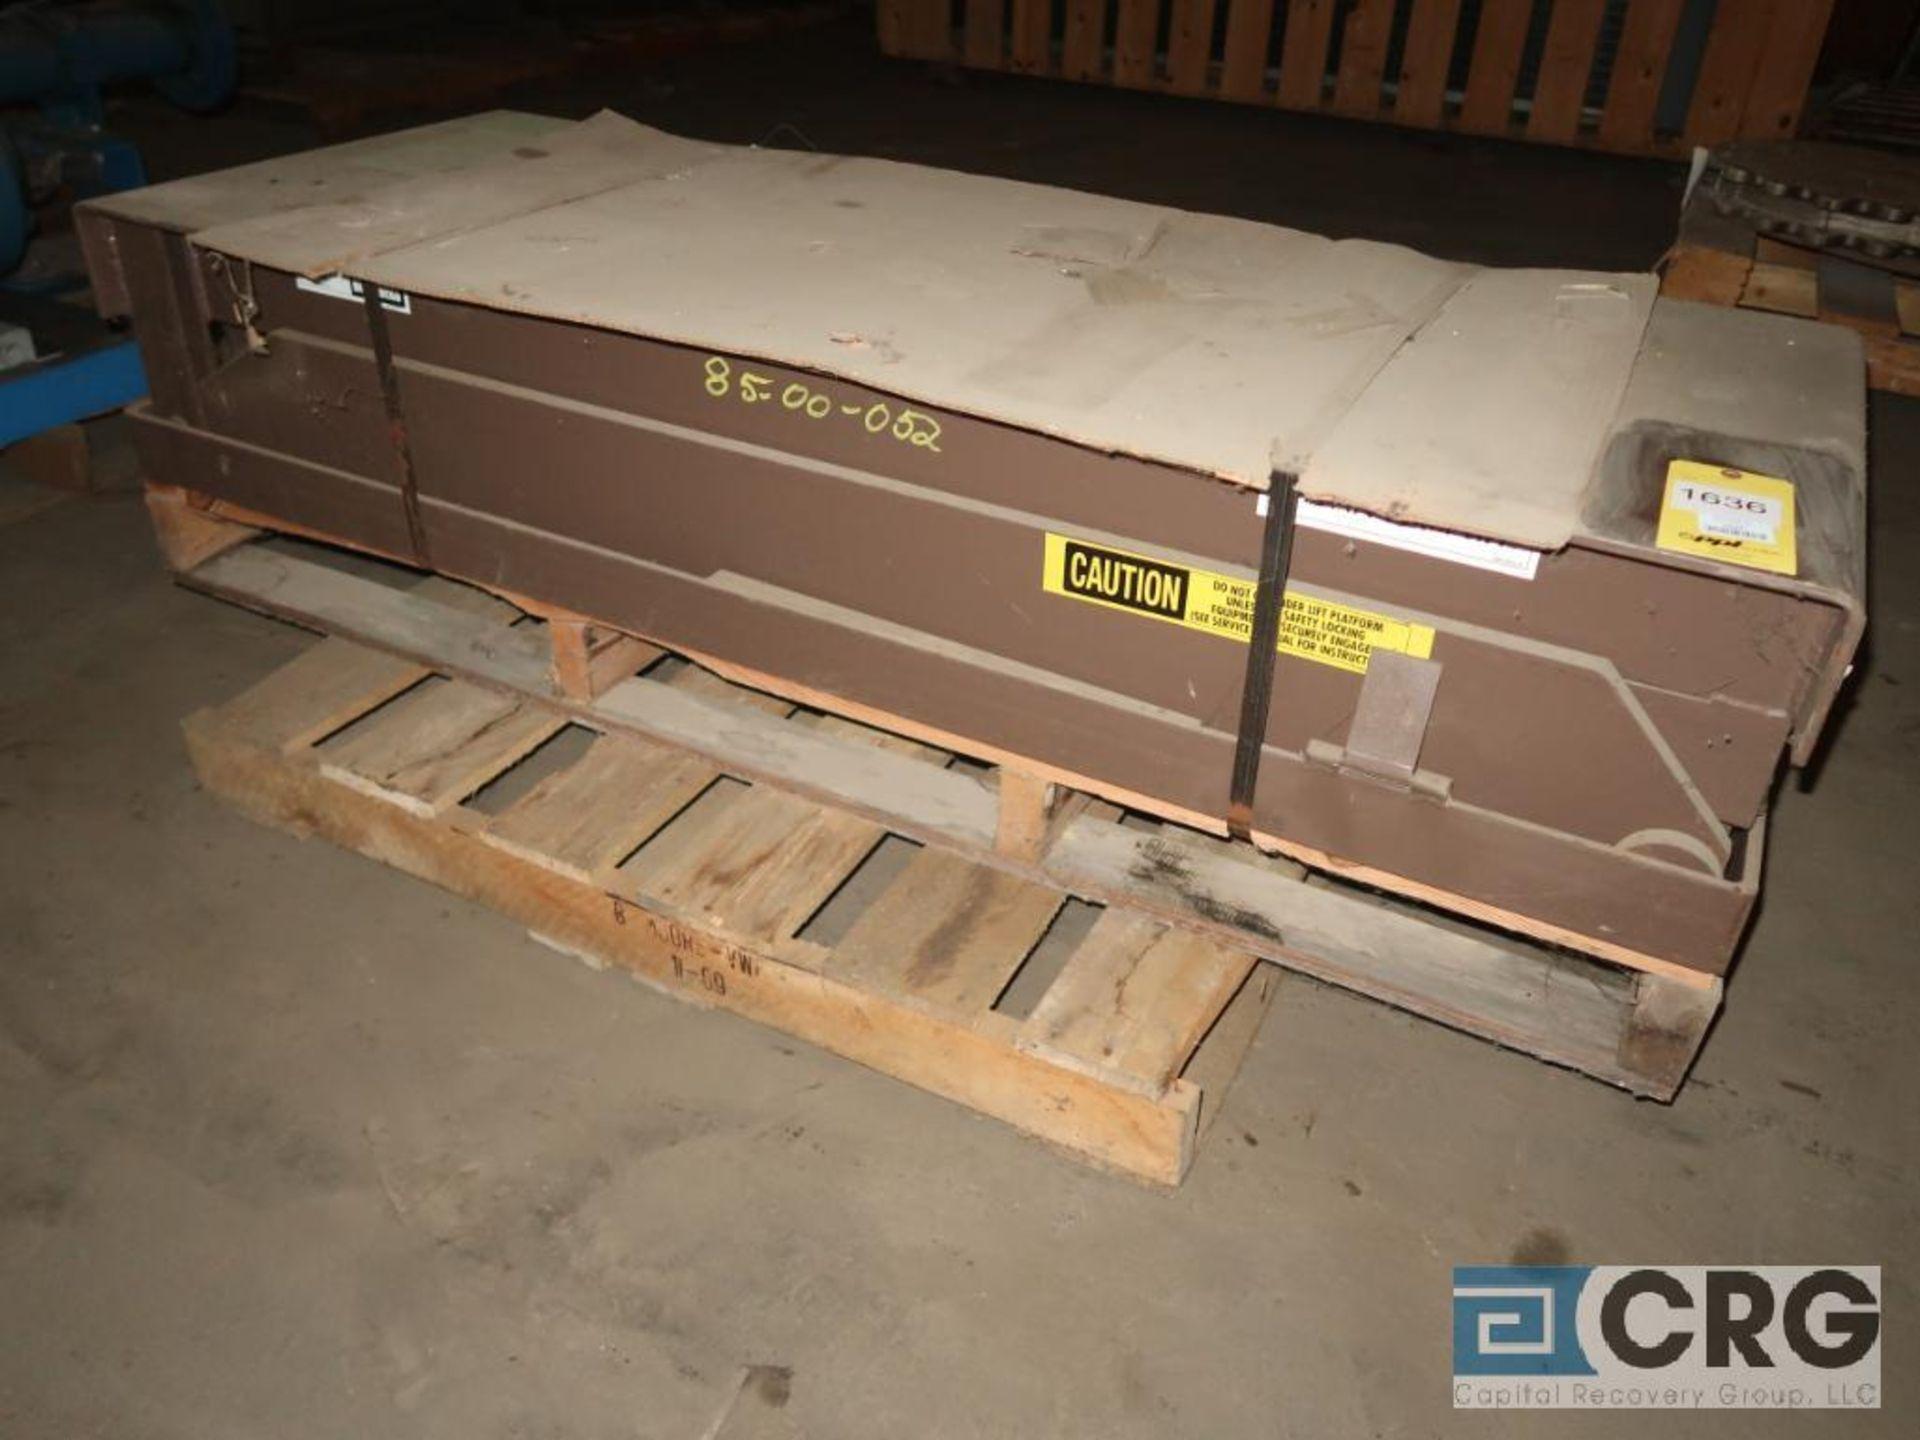 Autoquip GC8FJ hydraulic lift table, 64 in. L x 24 in. W, 8,000 lb. cap., s/n 61187 (Off Site